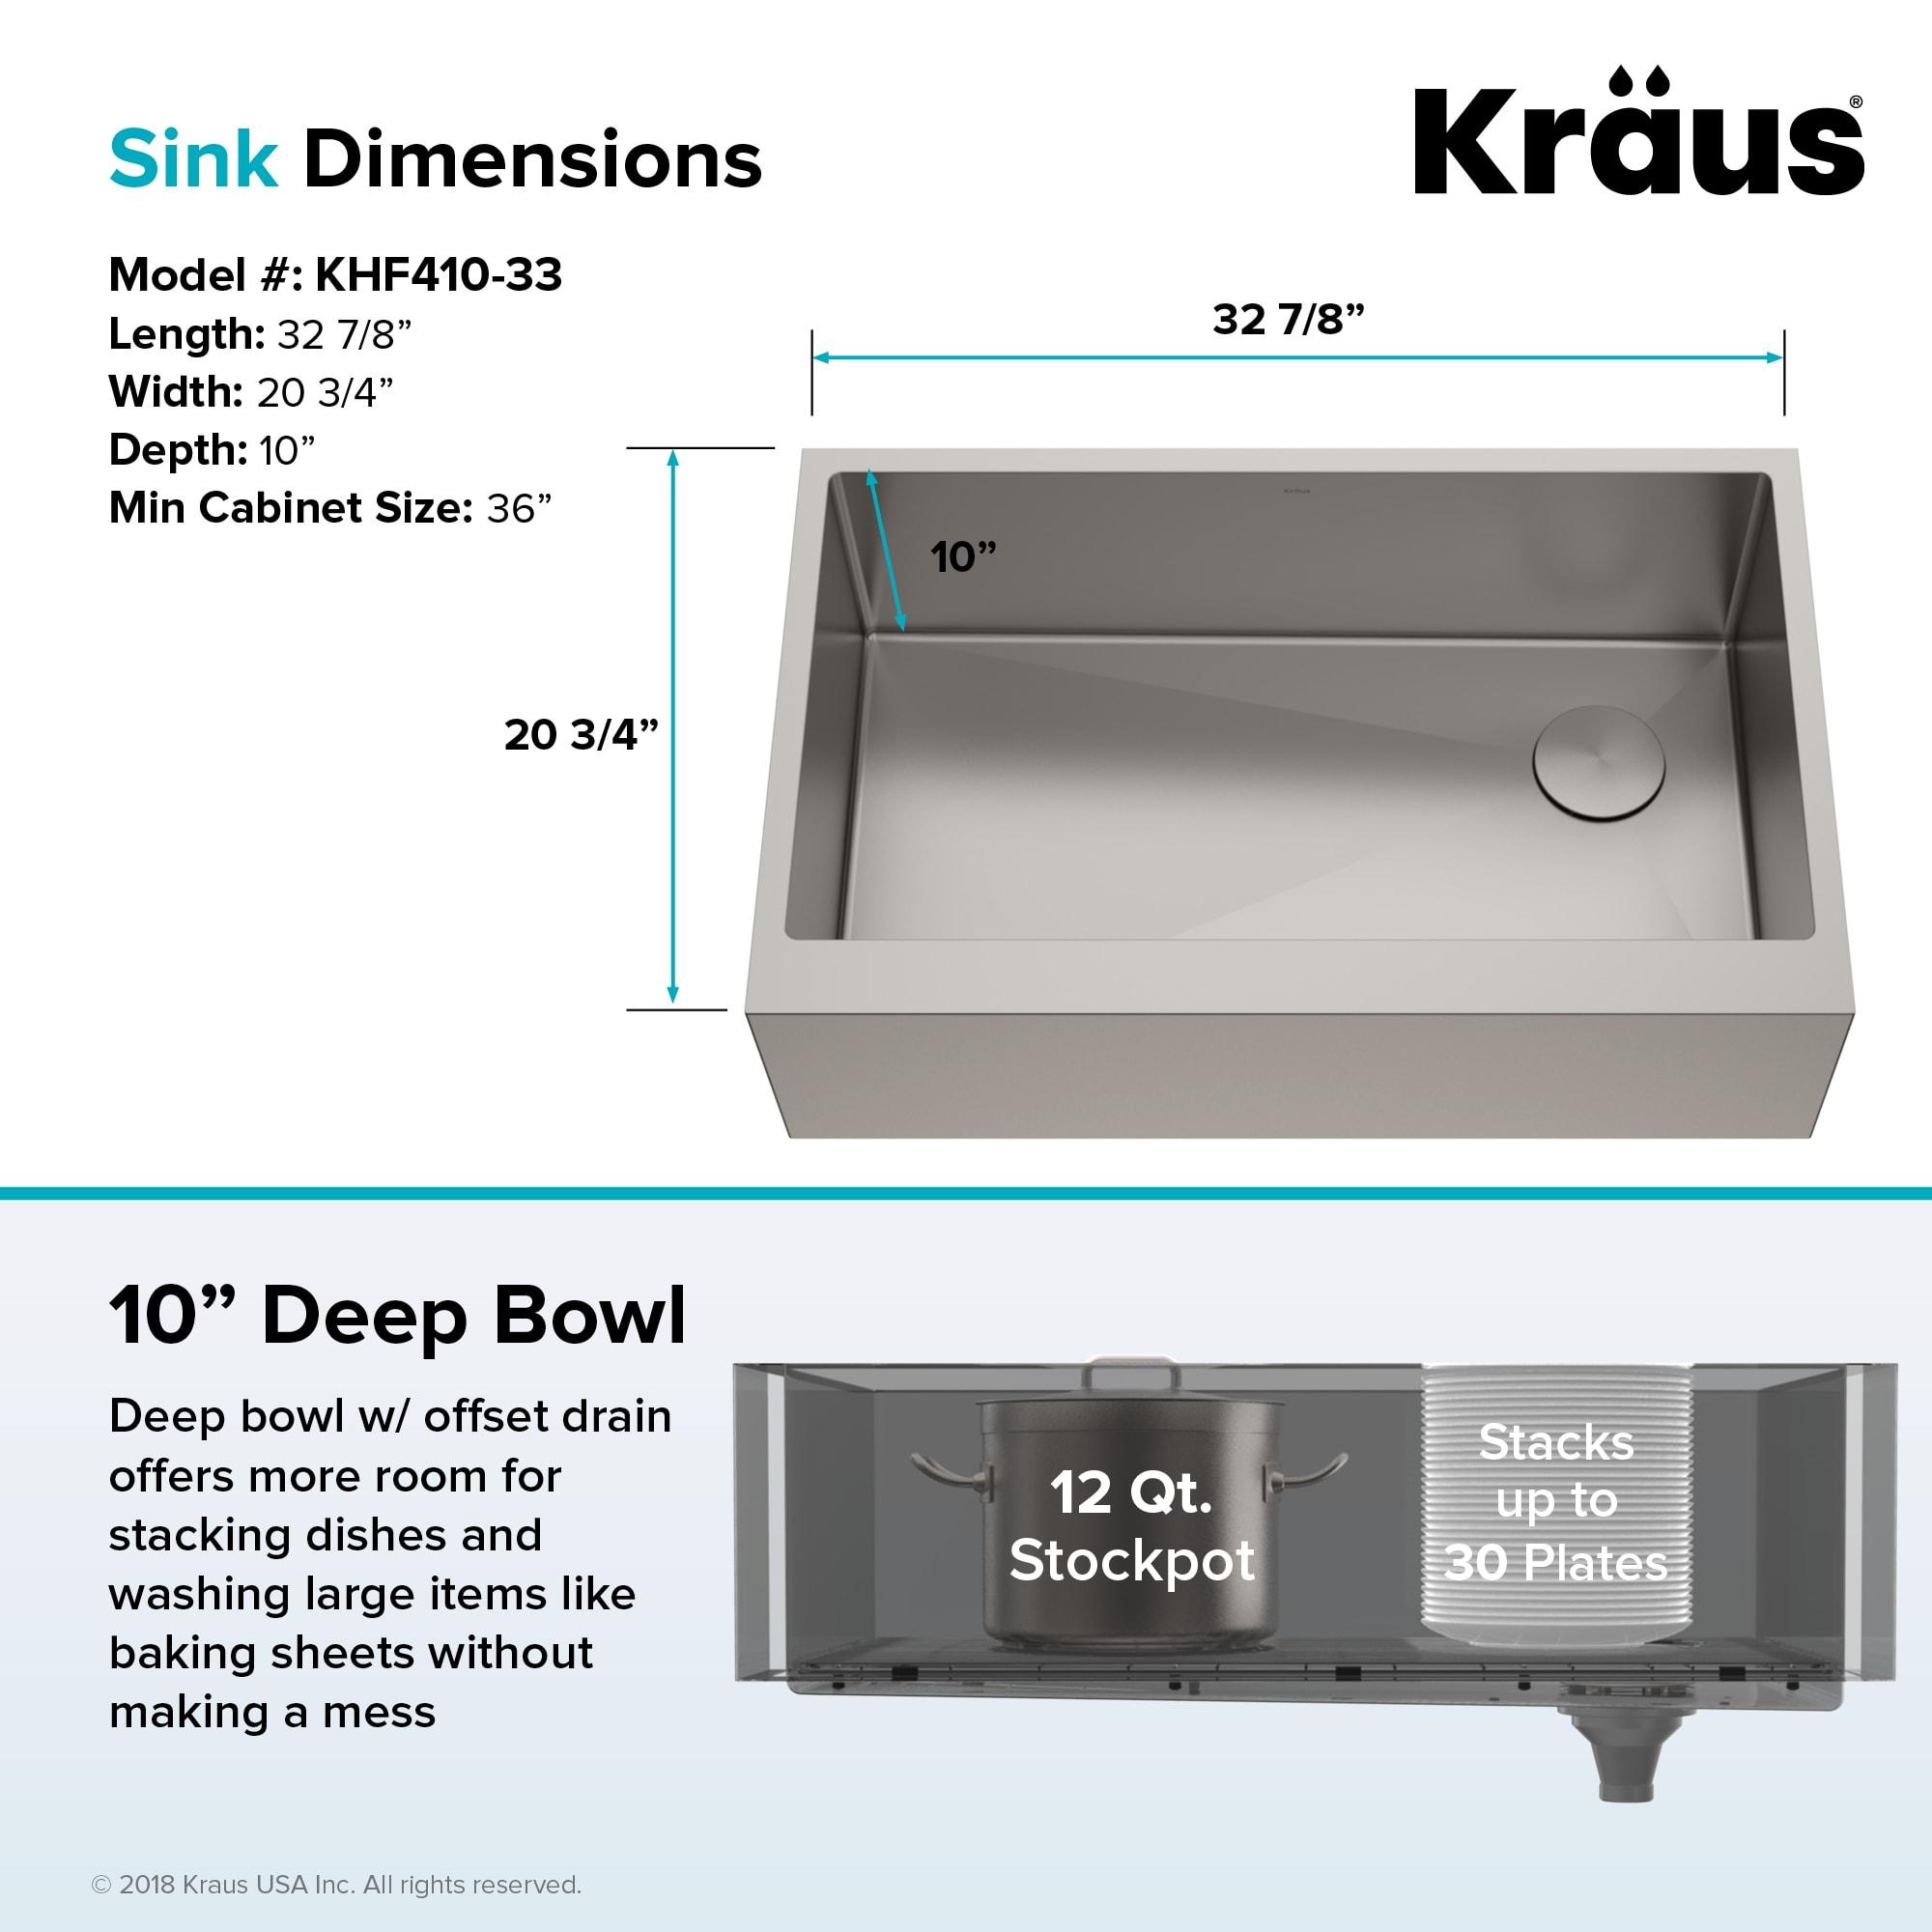 Kraus Khf410 33 Stainless Steel